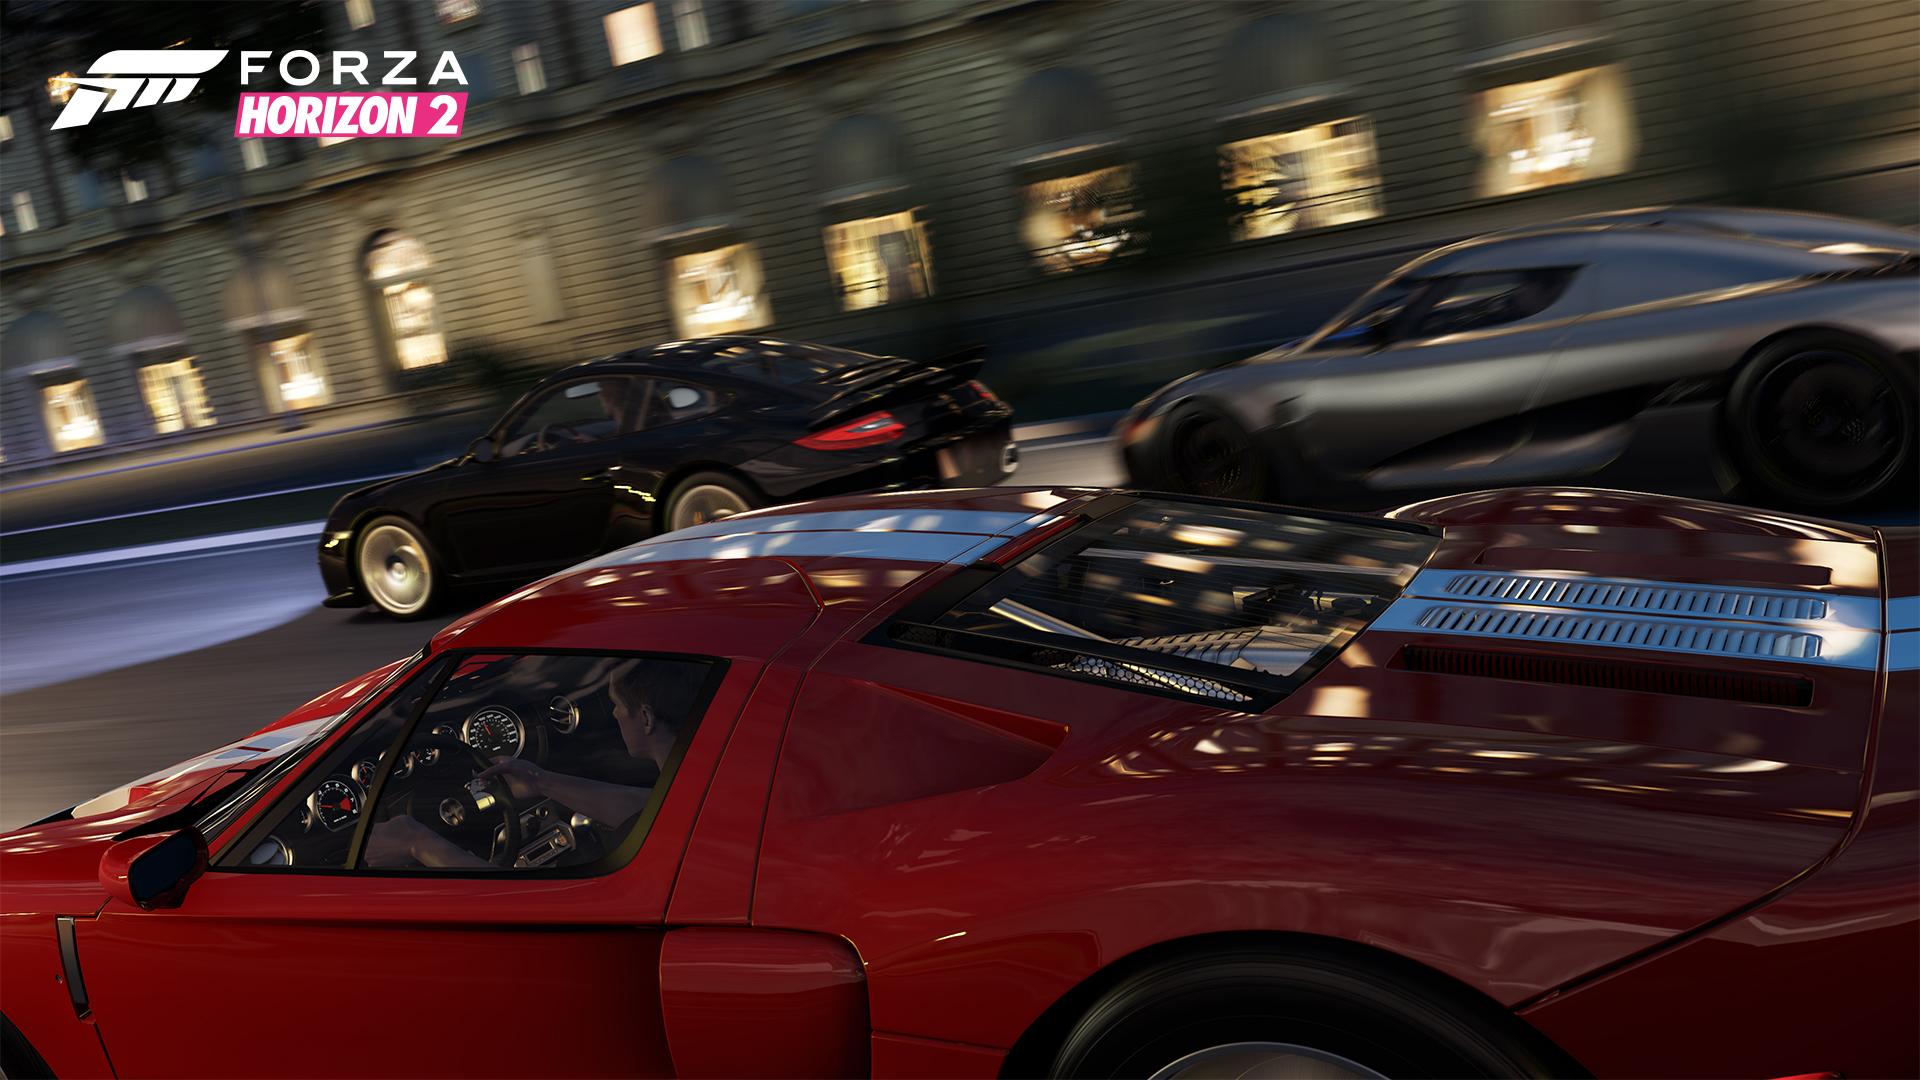 Forza Motorsport - Welcome to Forza Horizon 2!